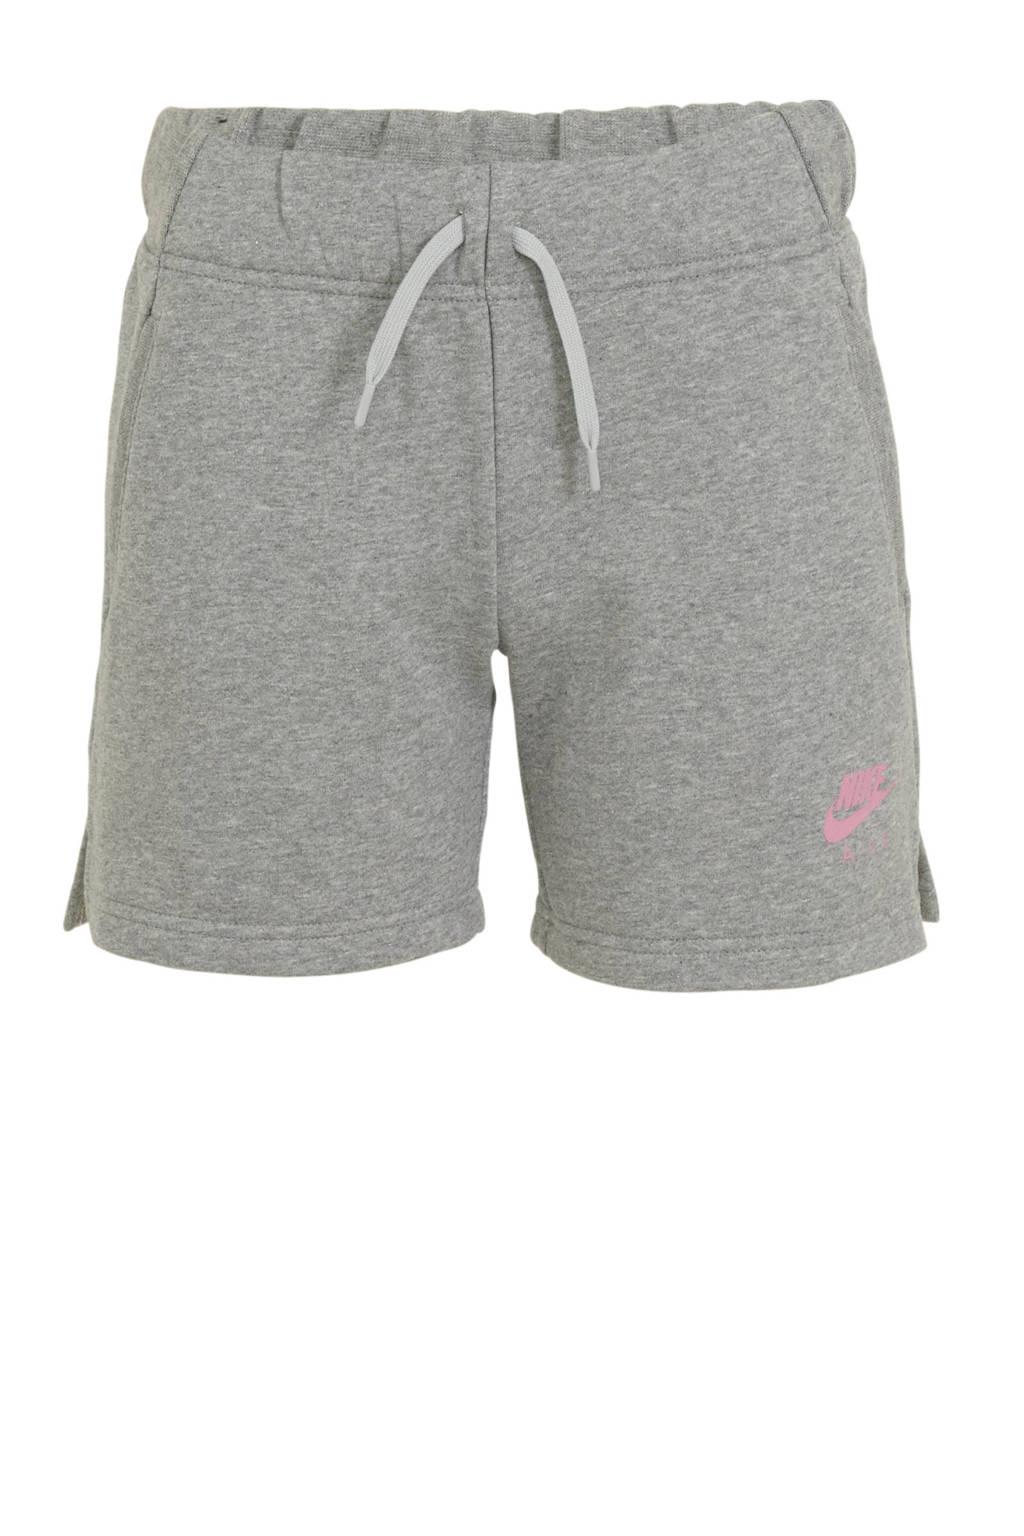 Nike short grijs, Grijs